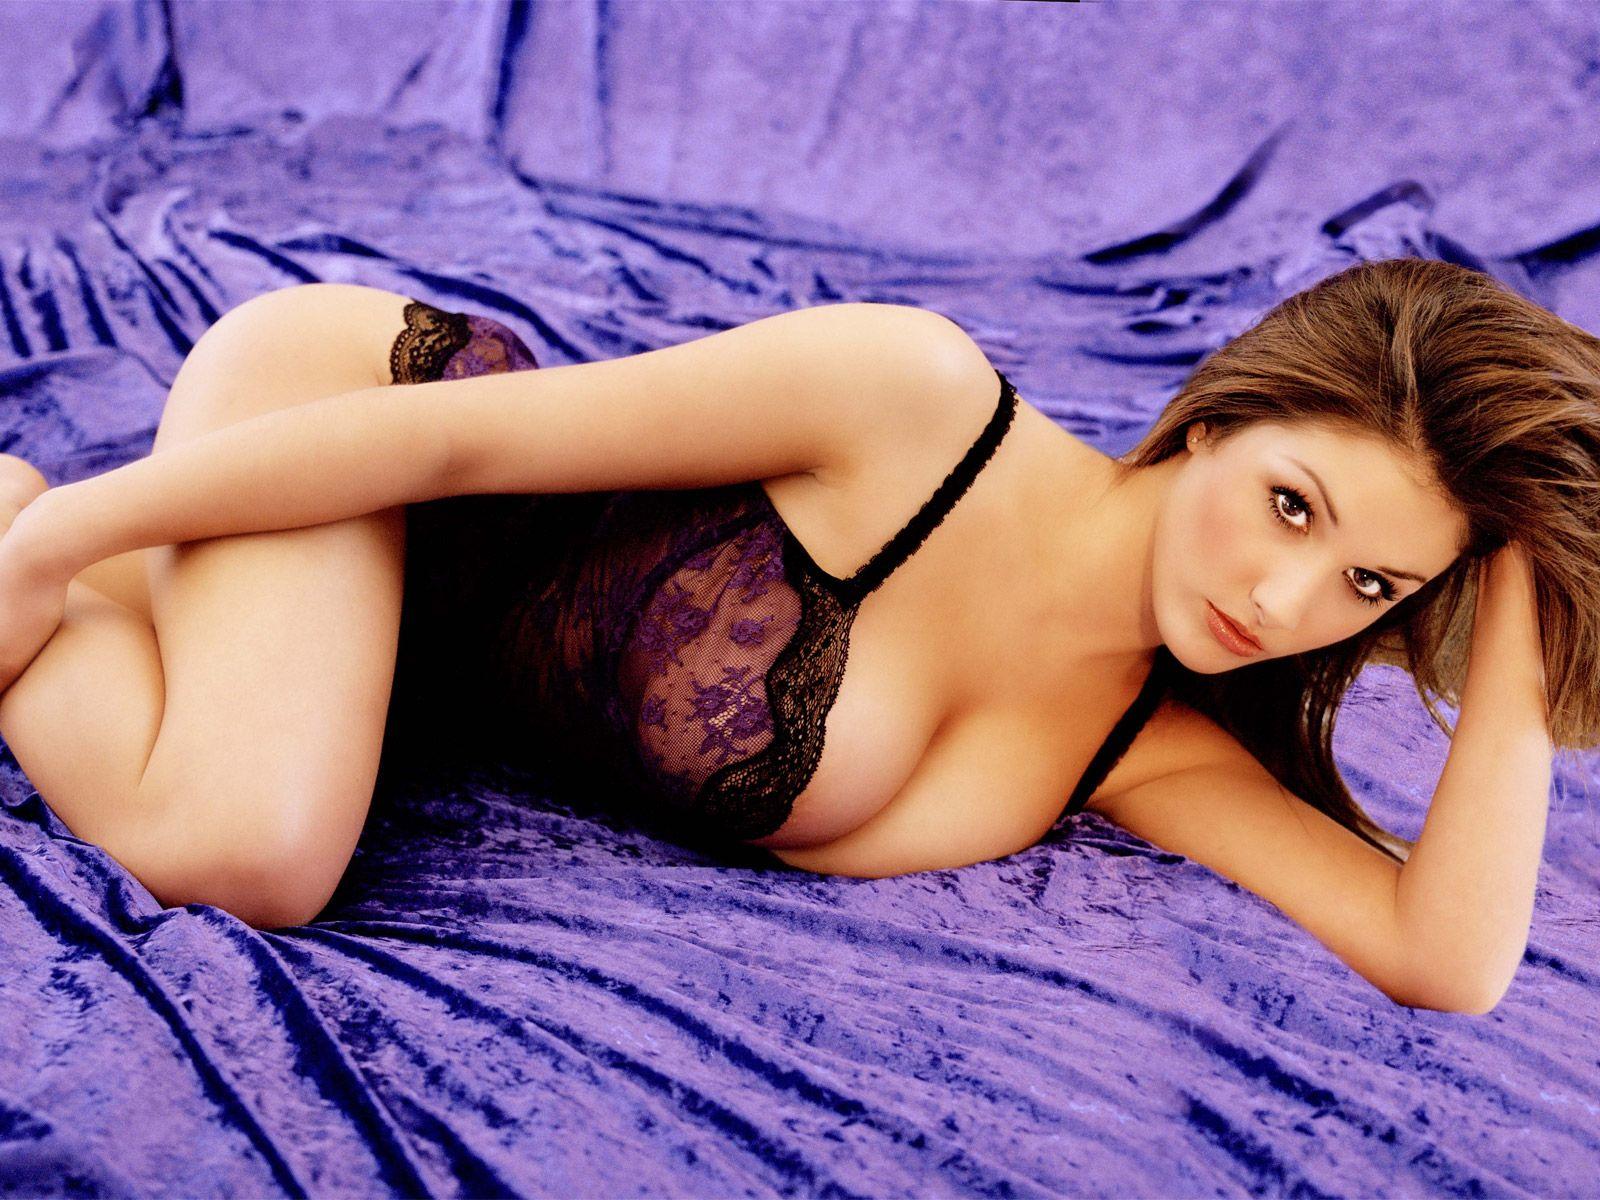 Alison arngrim topless